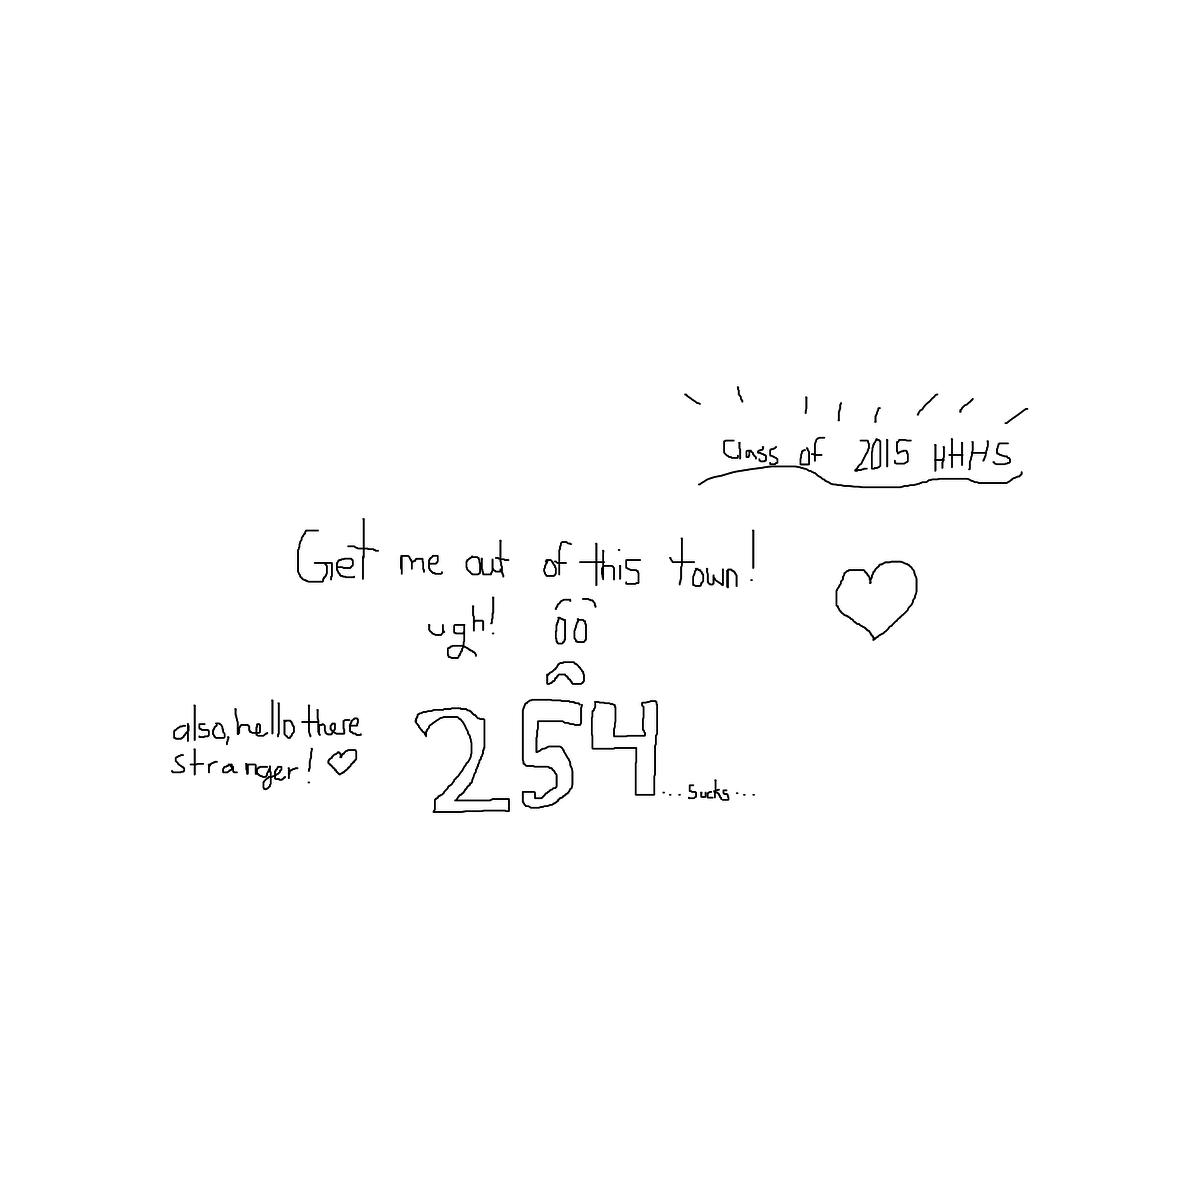 BAAAM drawing#7607 lat:31.0689315795898440lng: -97.6627120971679700